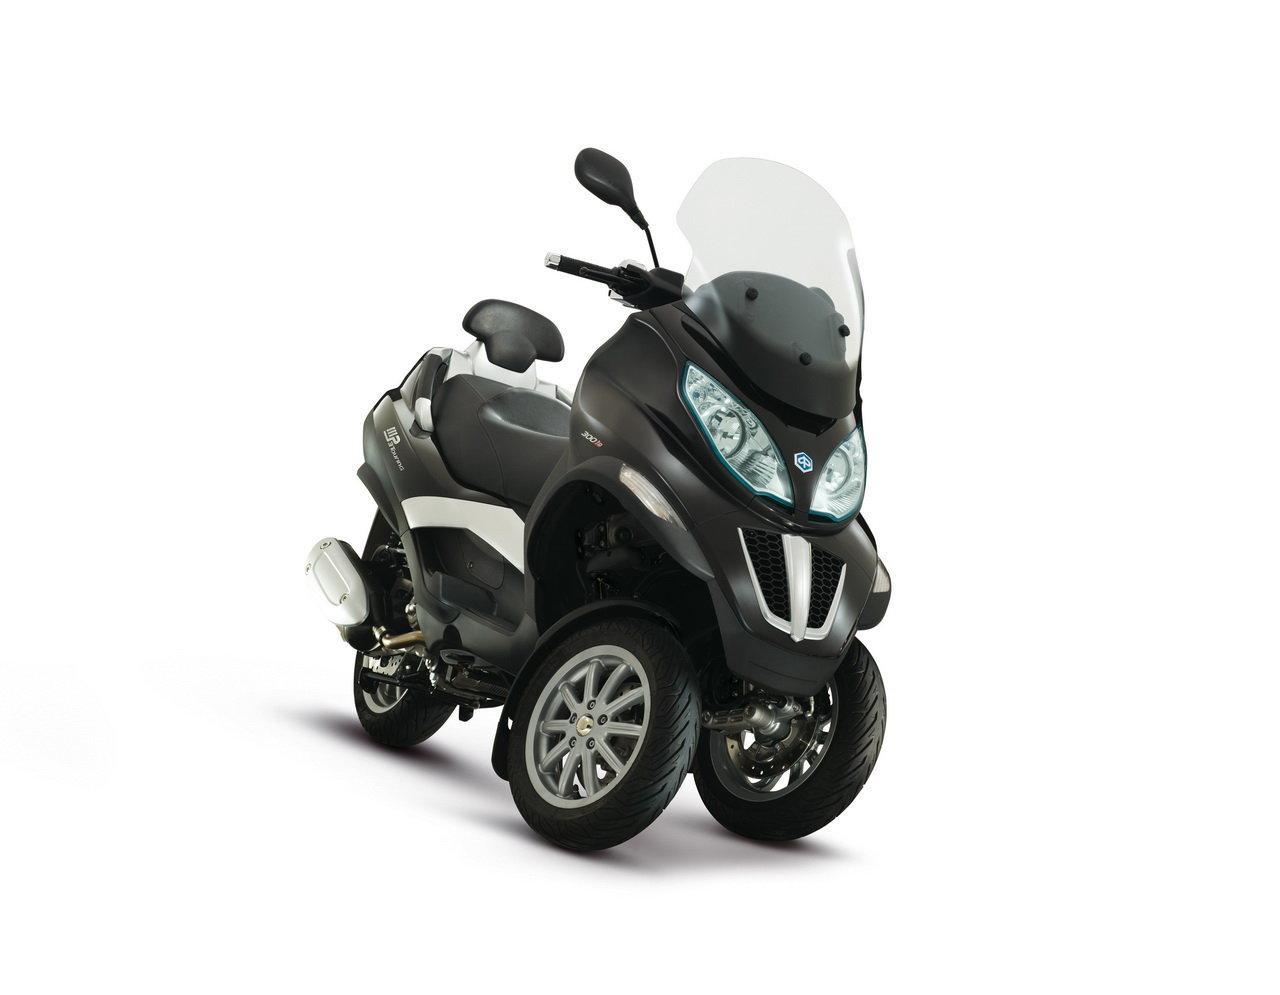 Listino Piaggio Fly 150 Scooter 150-300 - image 15100_piaggio-mp3300-ie-touring-lt on https://moto.motori.net